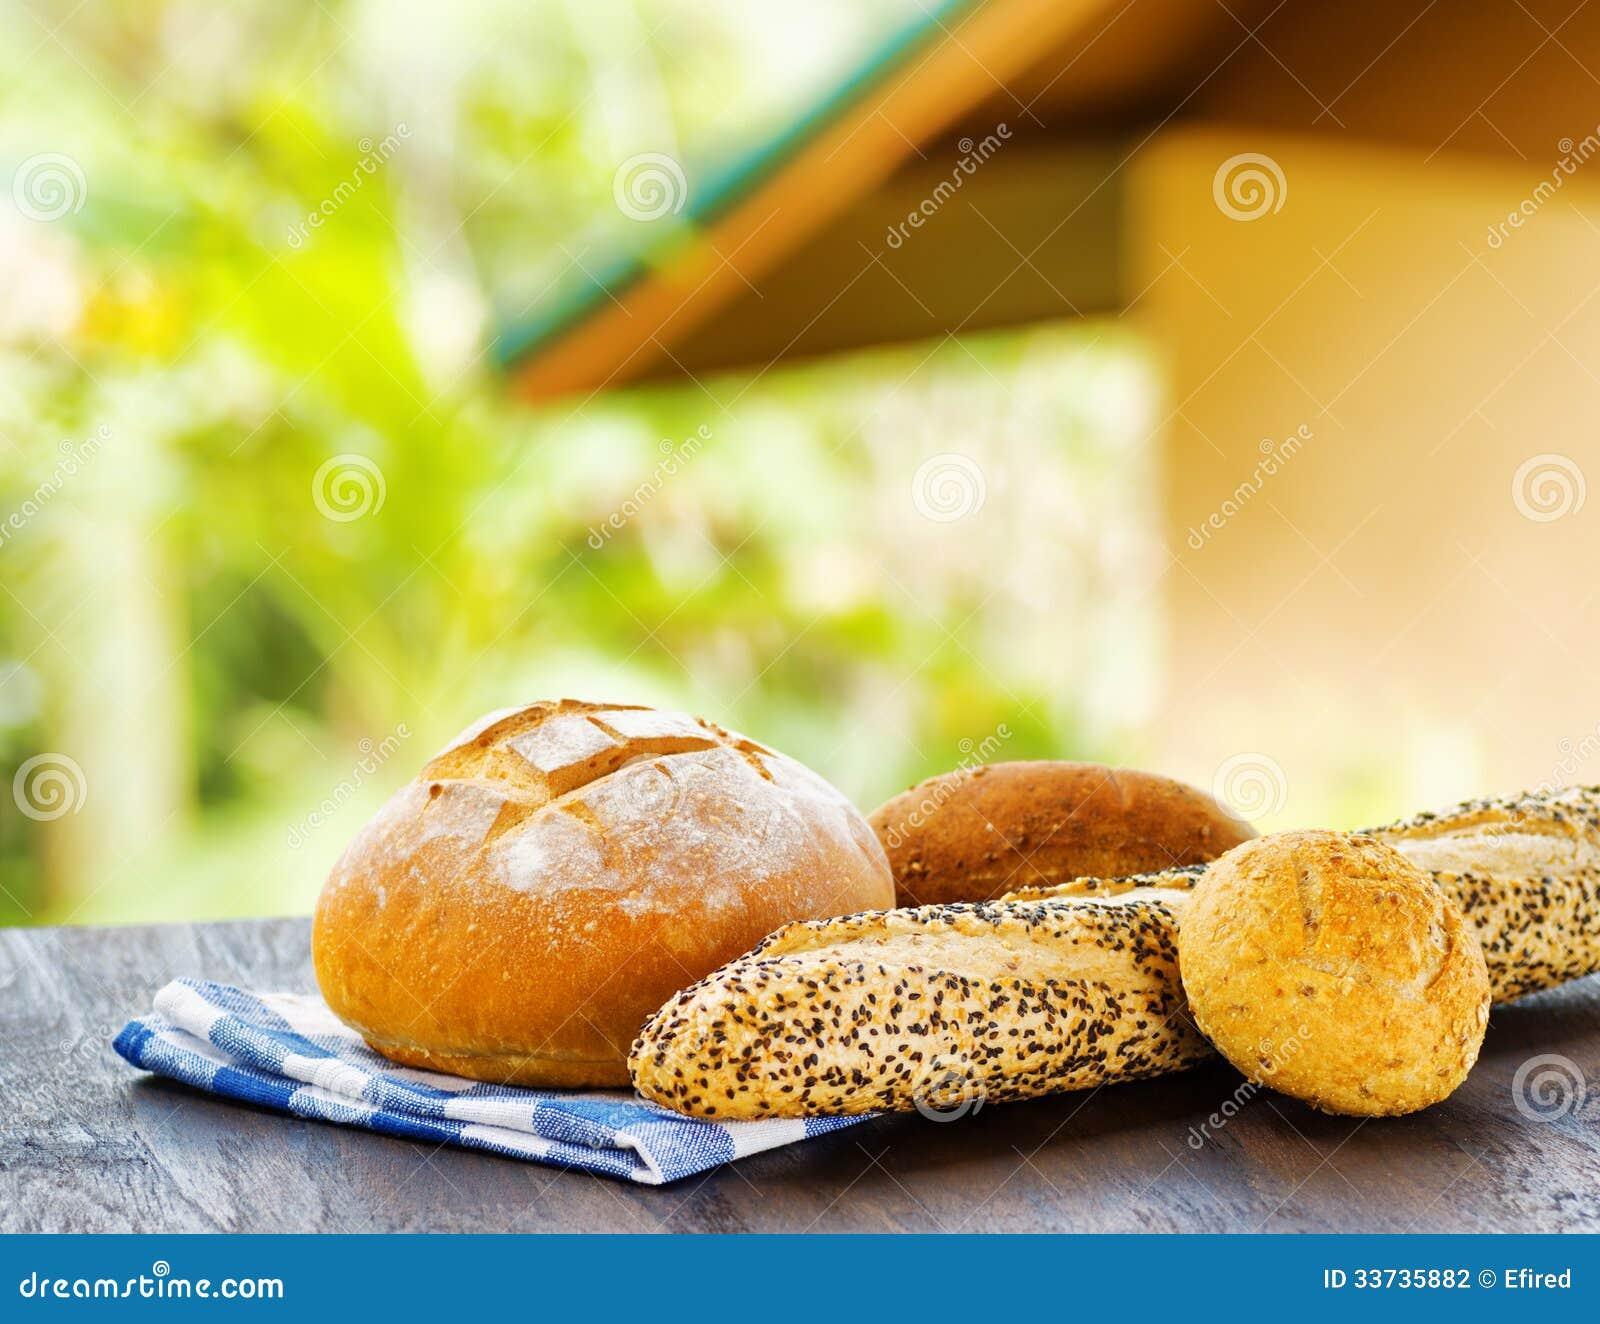 Свежий хлеб и checkered салфетка на деревянном столе на сельском backgr